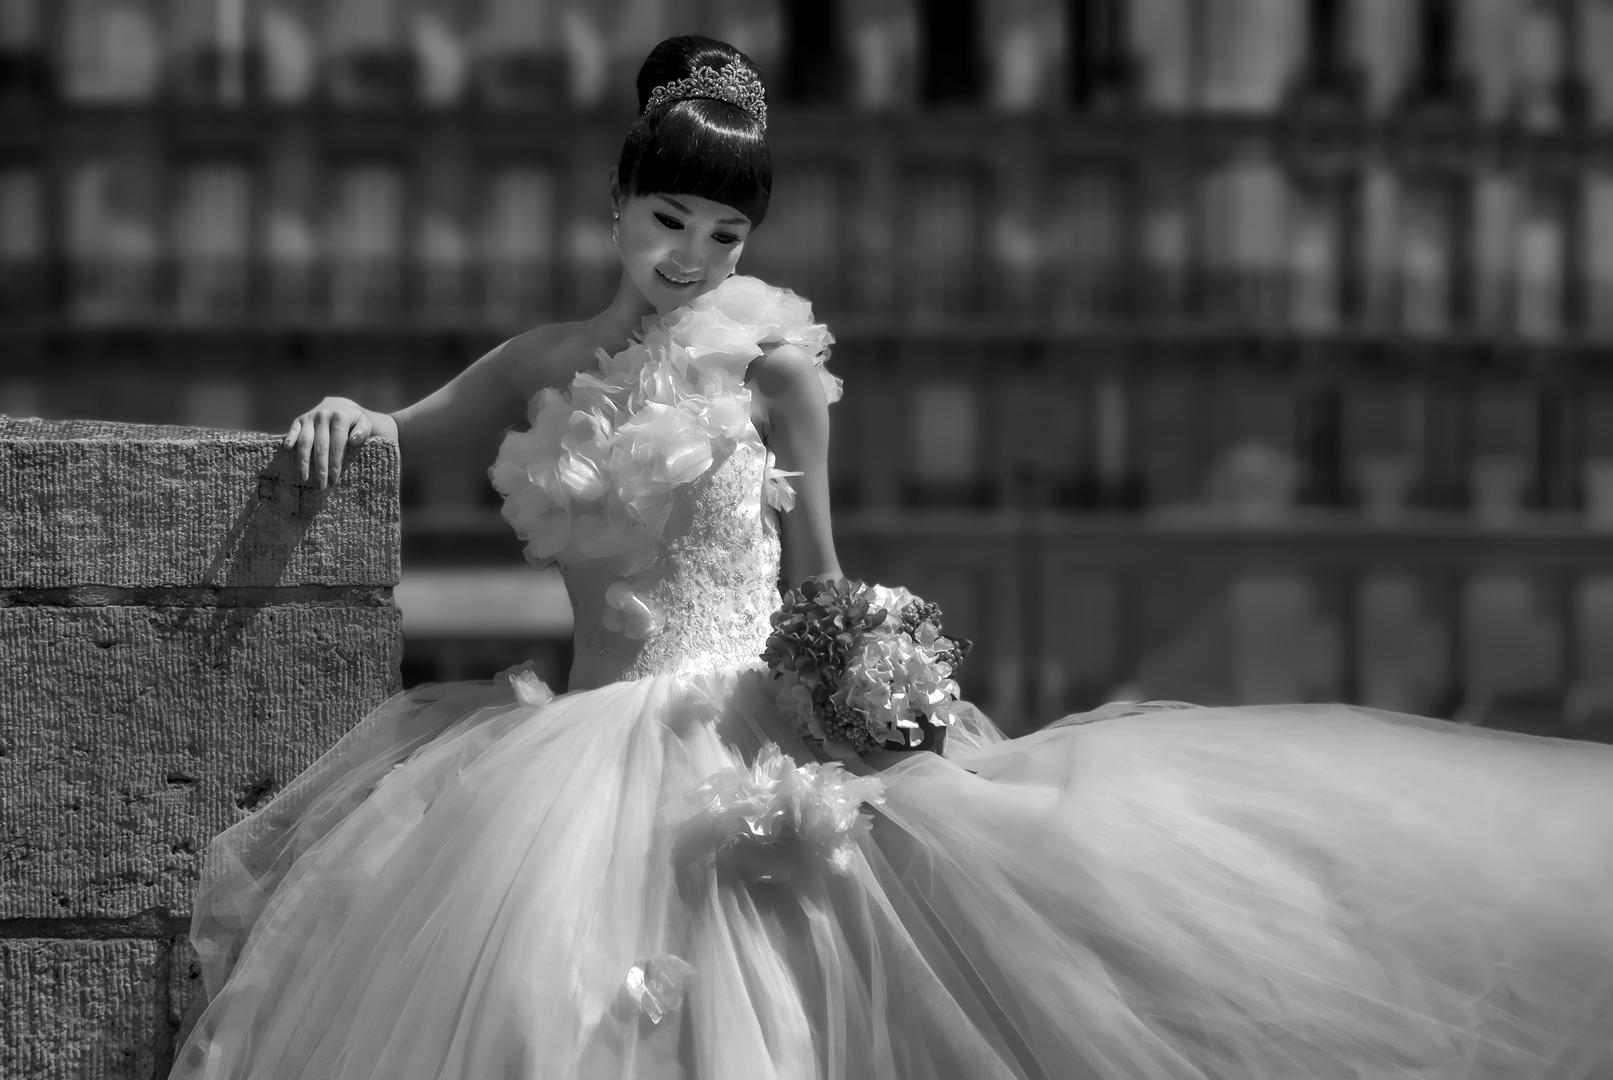 Helmut Plaha, Die Braut